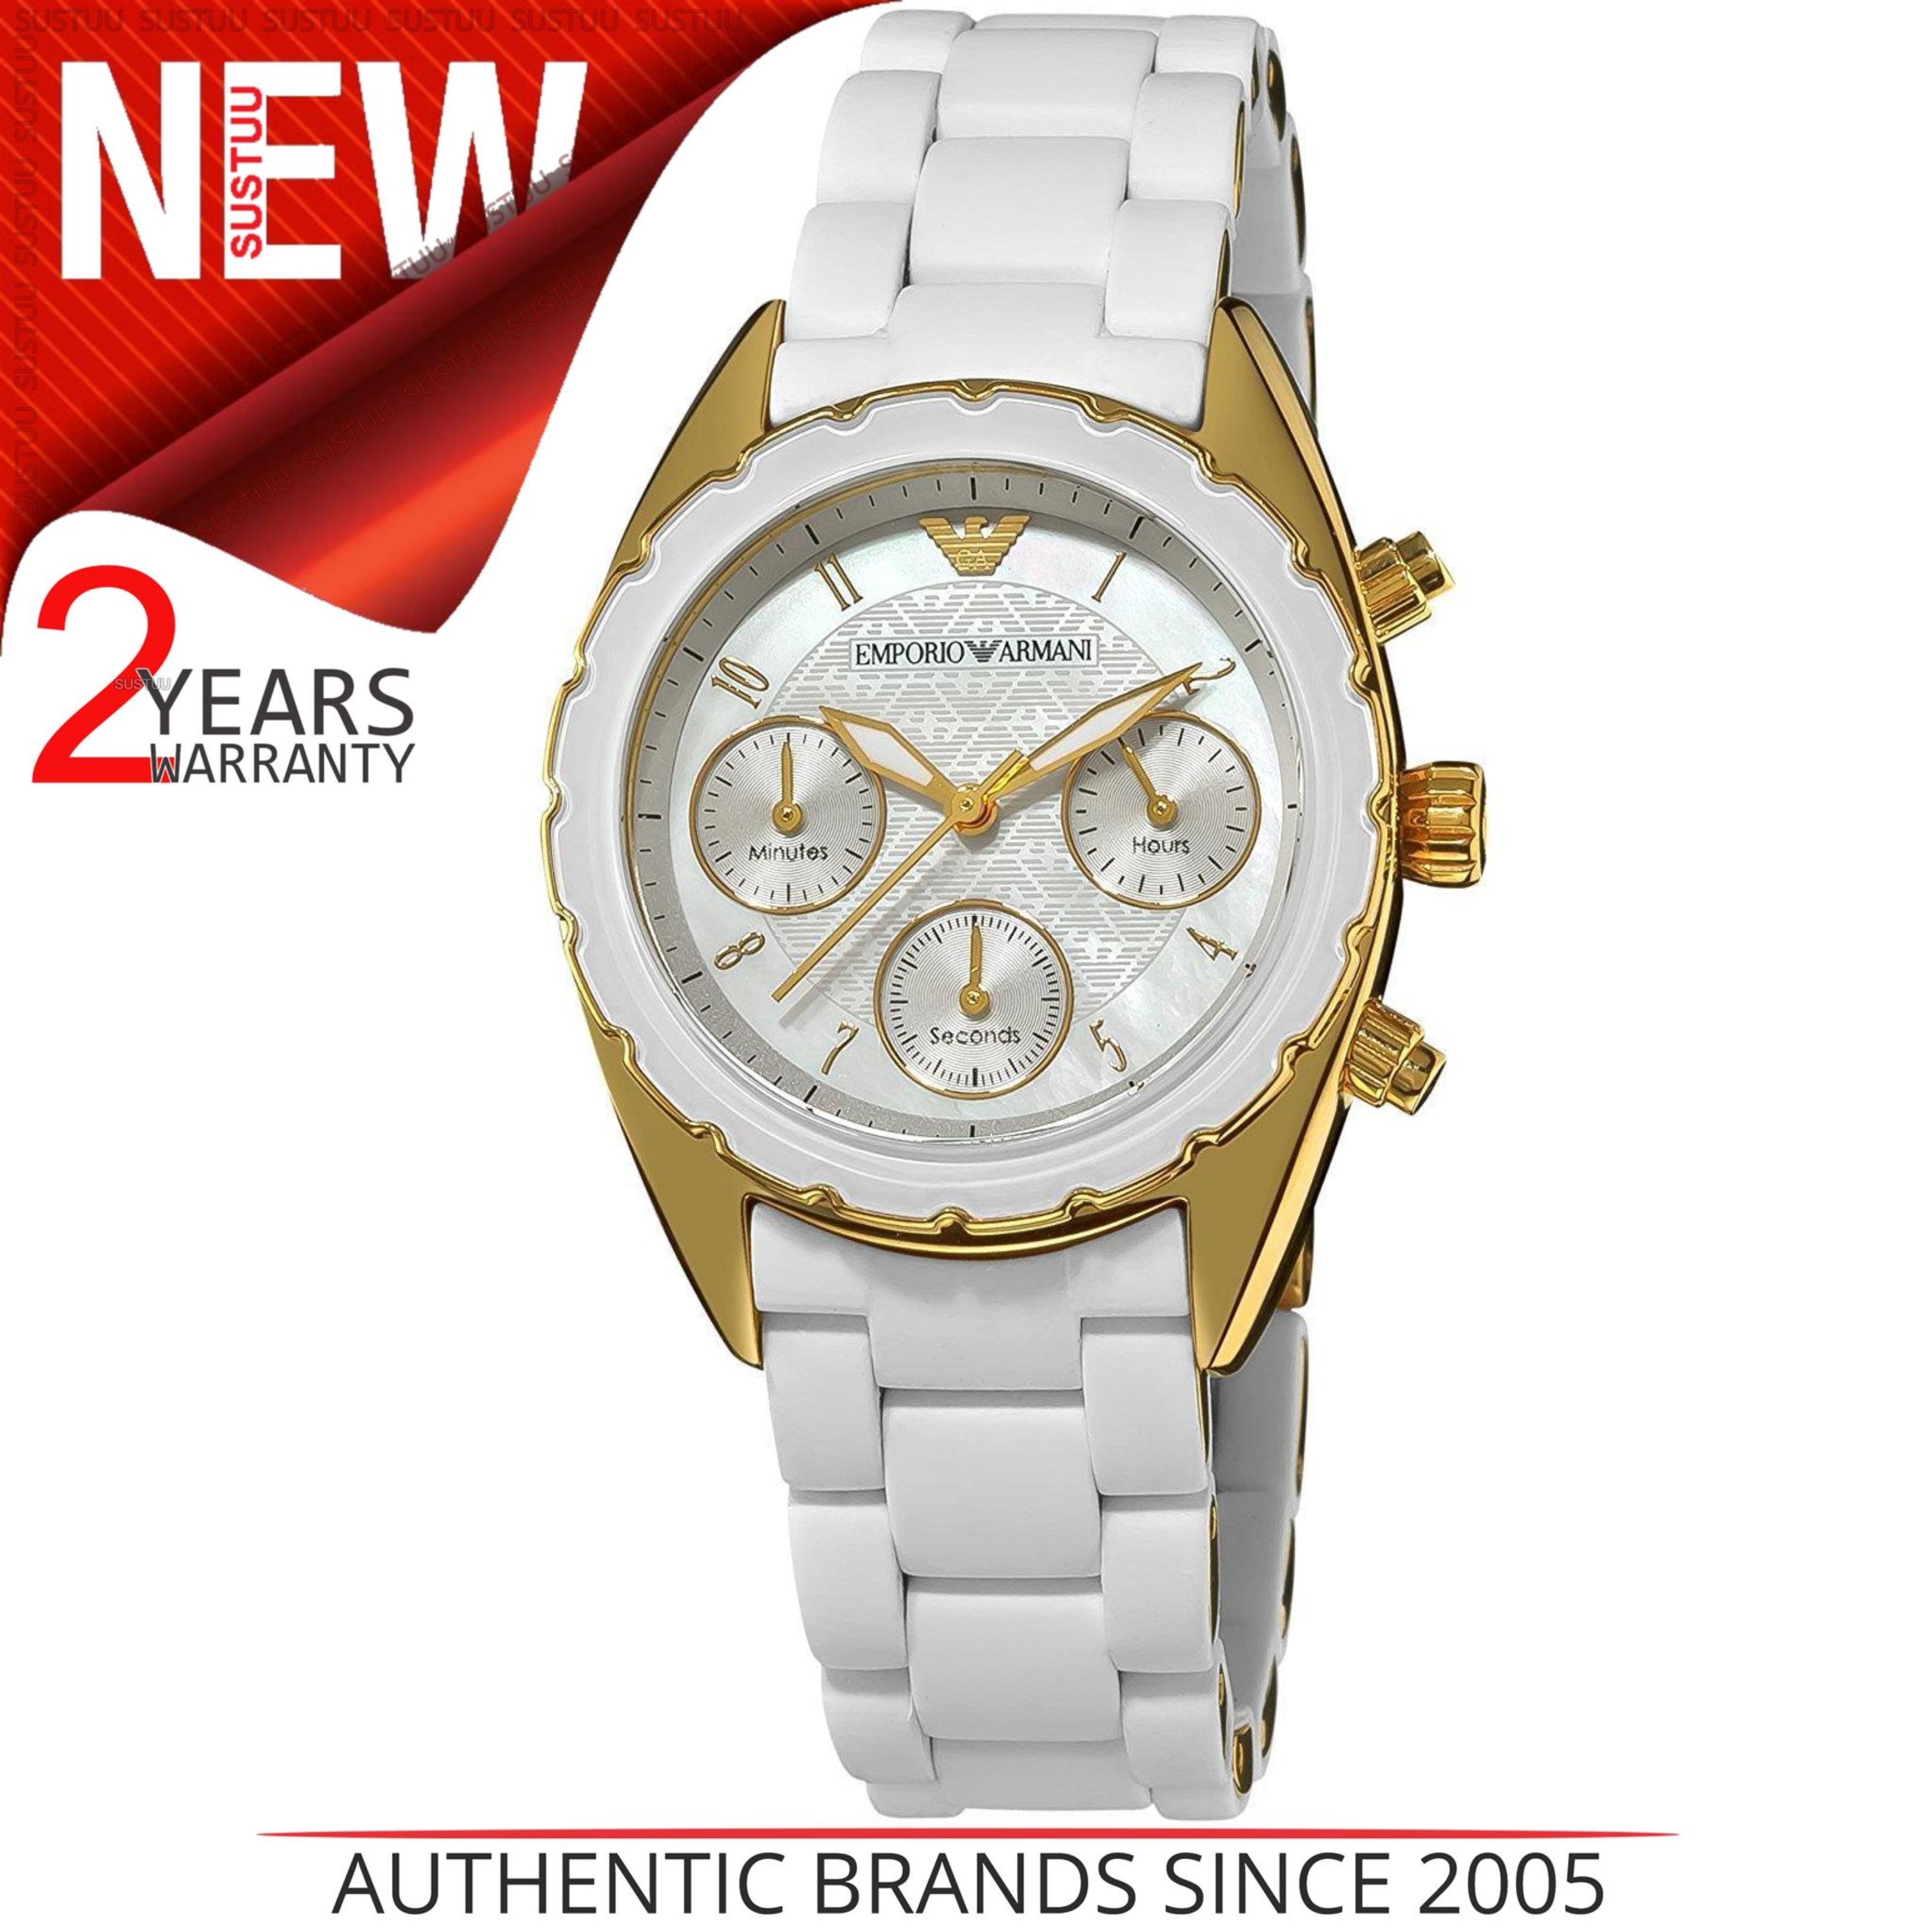 75bb8aace43 CENTINELA Emporio Armani Ladies Watch│Gold tono acero inoxidable  Case│Silicone Strap│AR5945